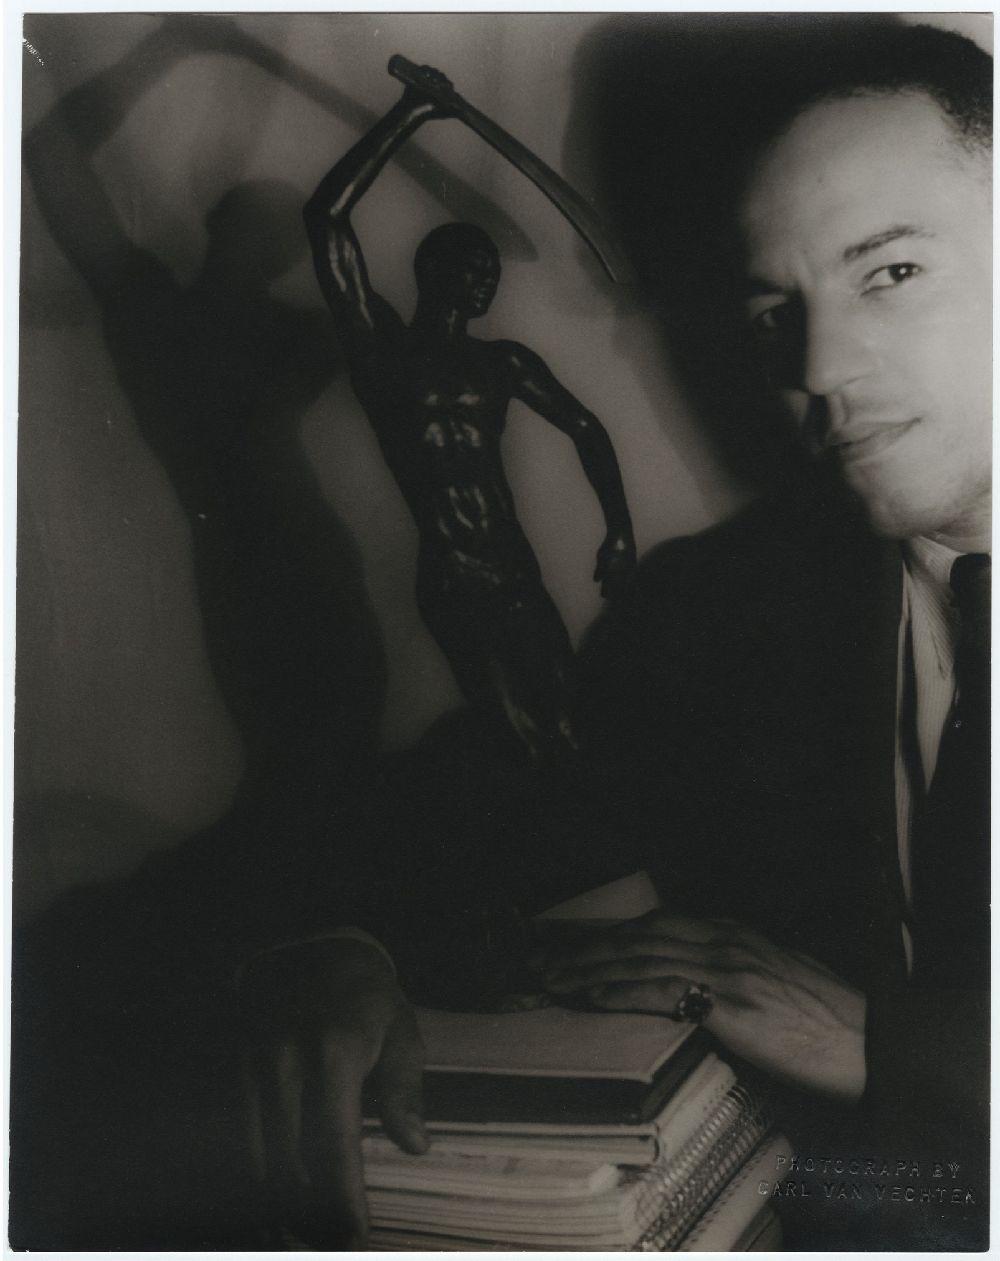 Richmond Barthé and his sculpture, Feral Benga, 1937.